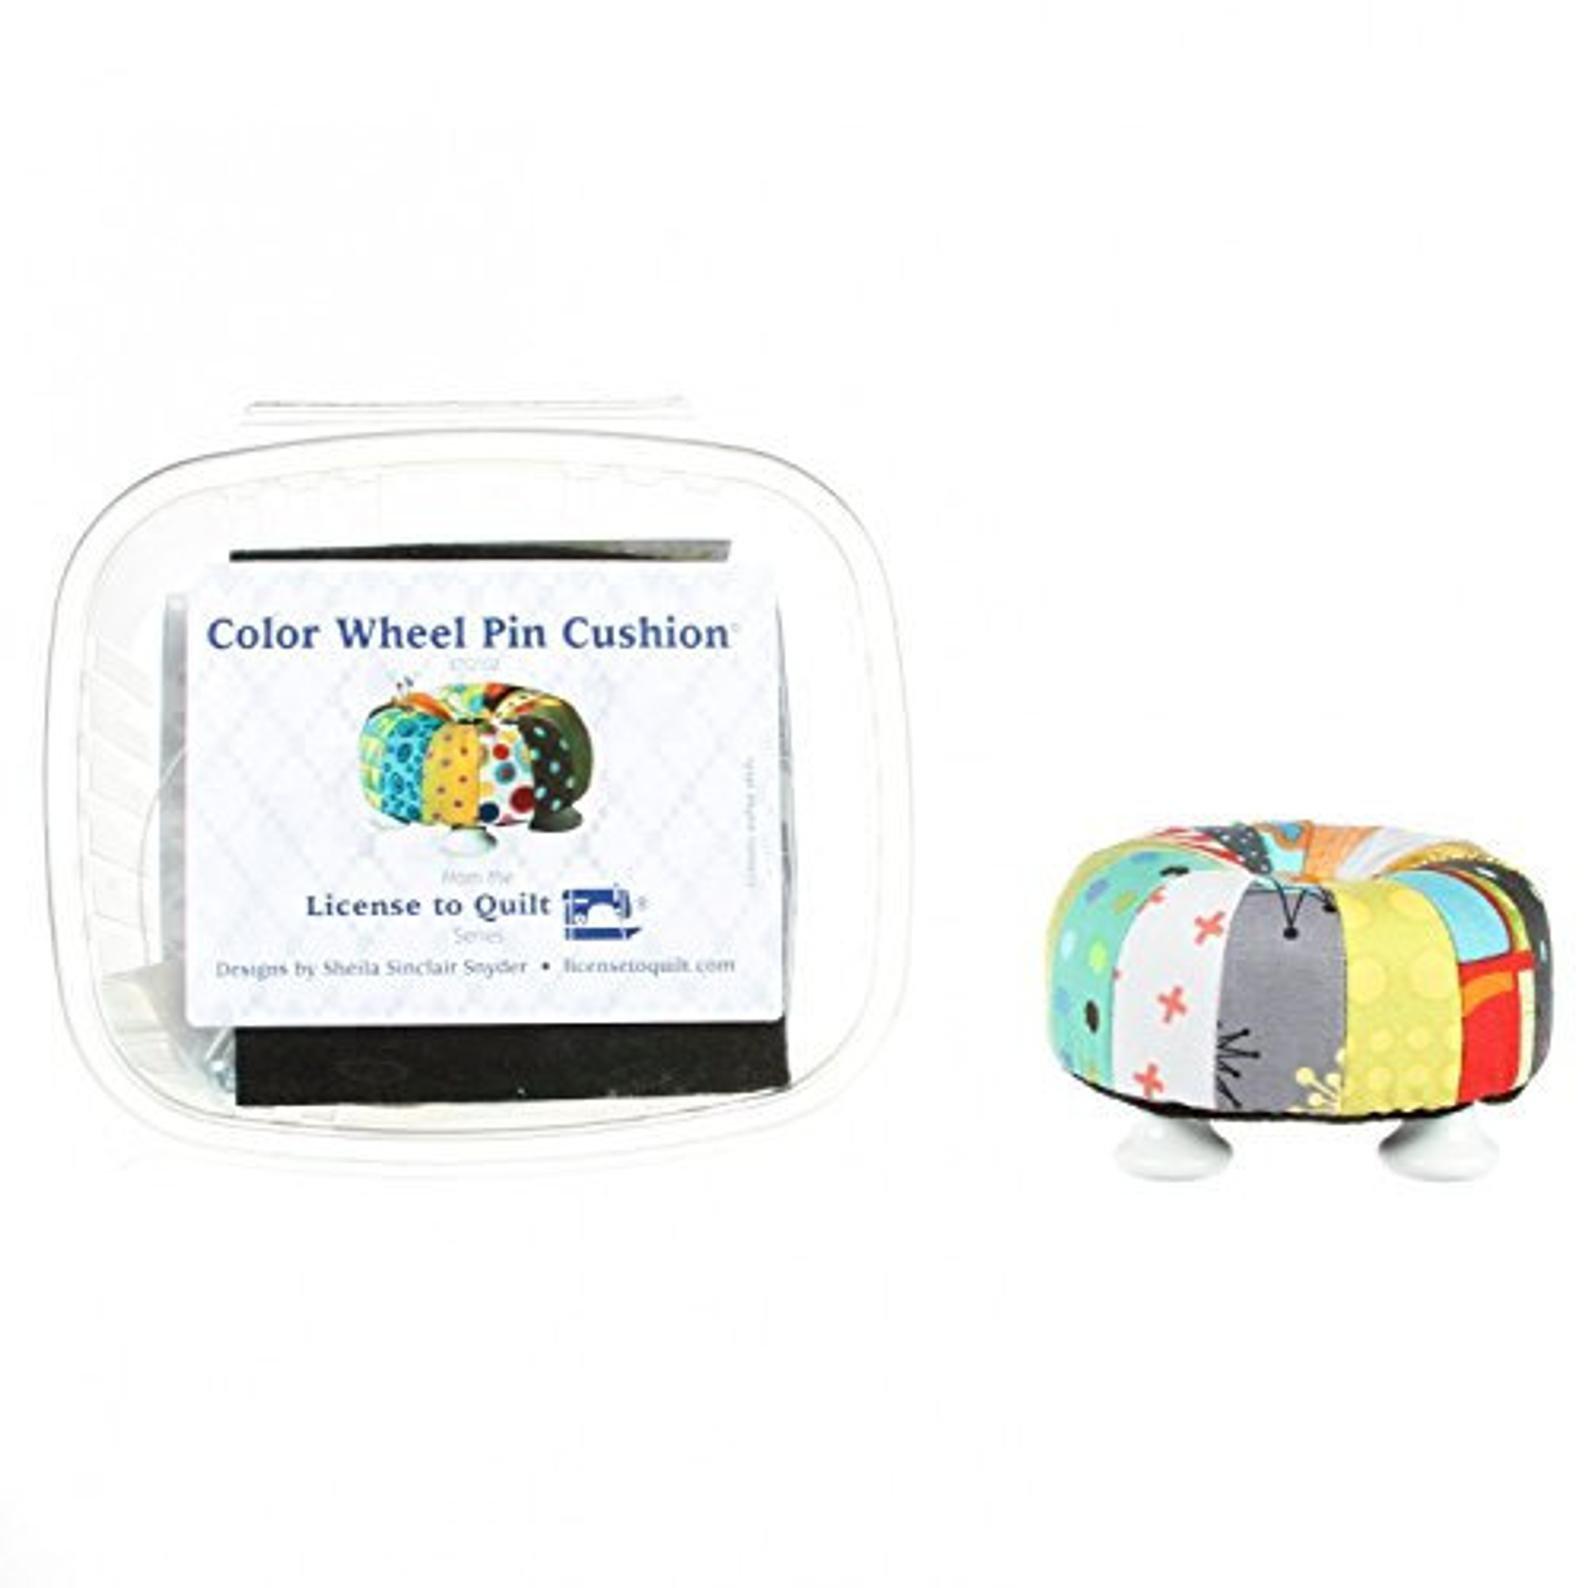 Color Wheel Tuffet Pin Cushion Kit